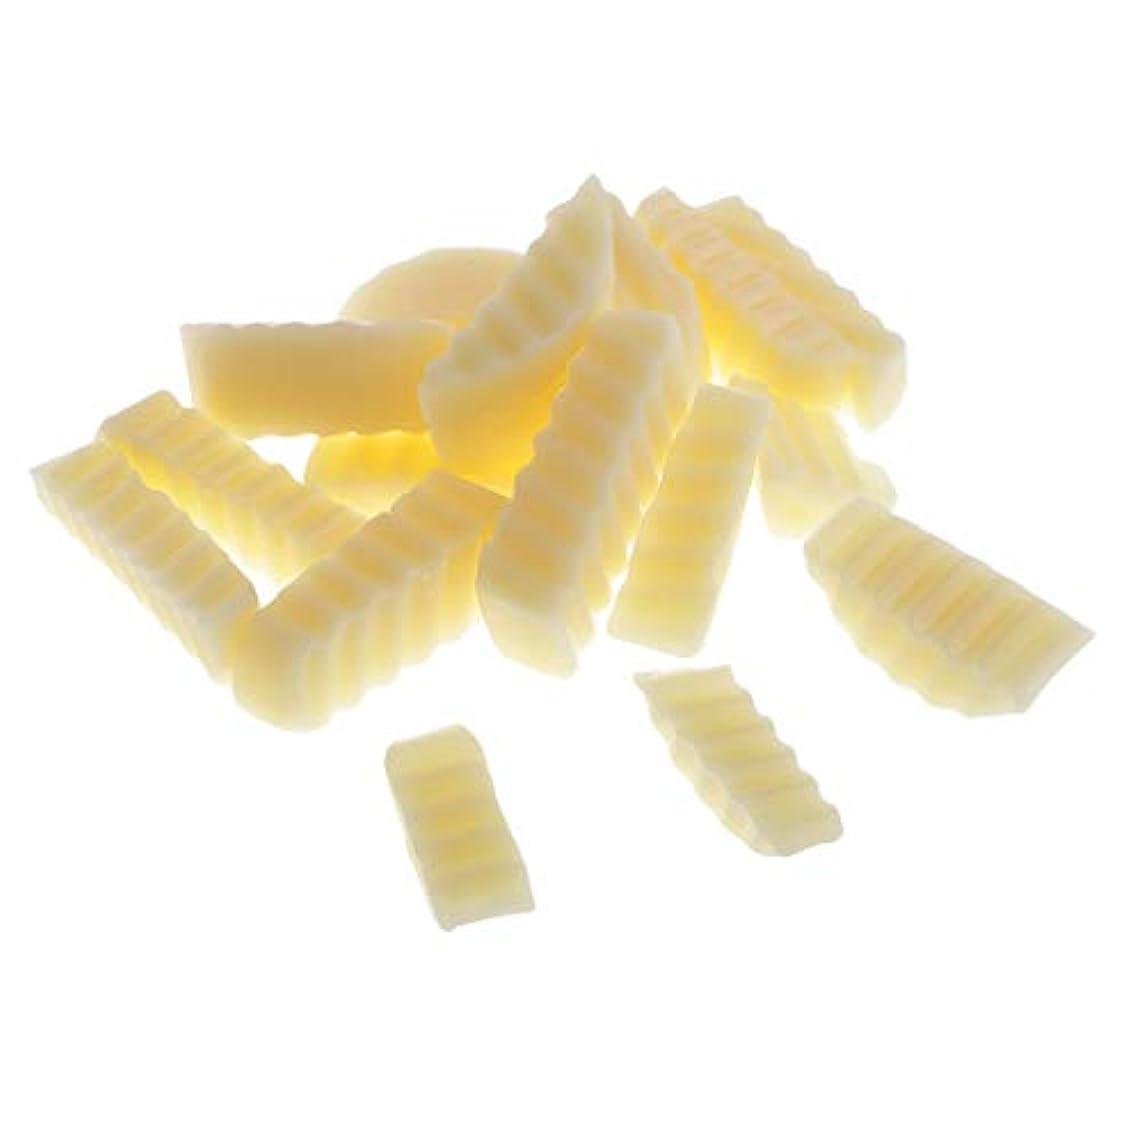 D DOLITY ラノリン石鹸 自然な素材 DIY工芸品 手作り 石鹸 固形せっけん 約250g /パック